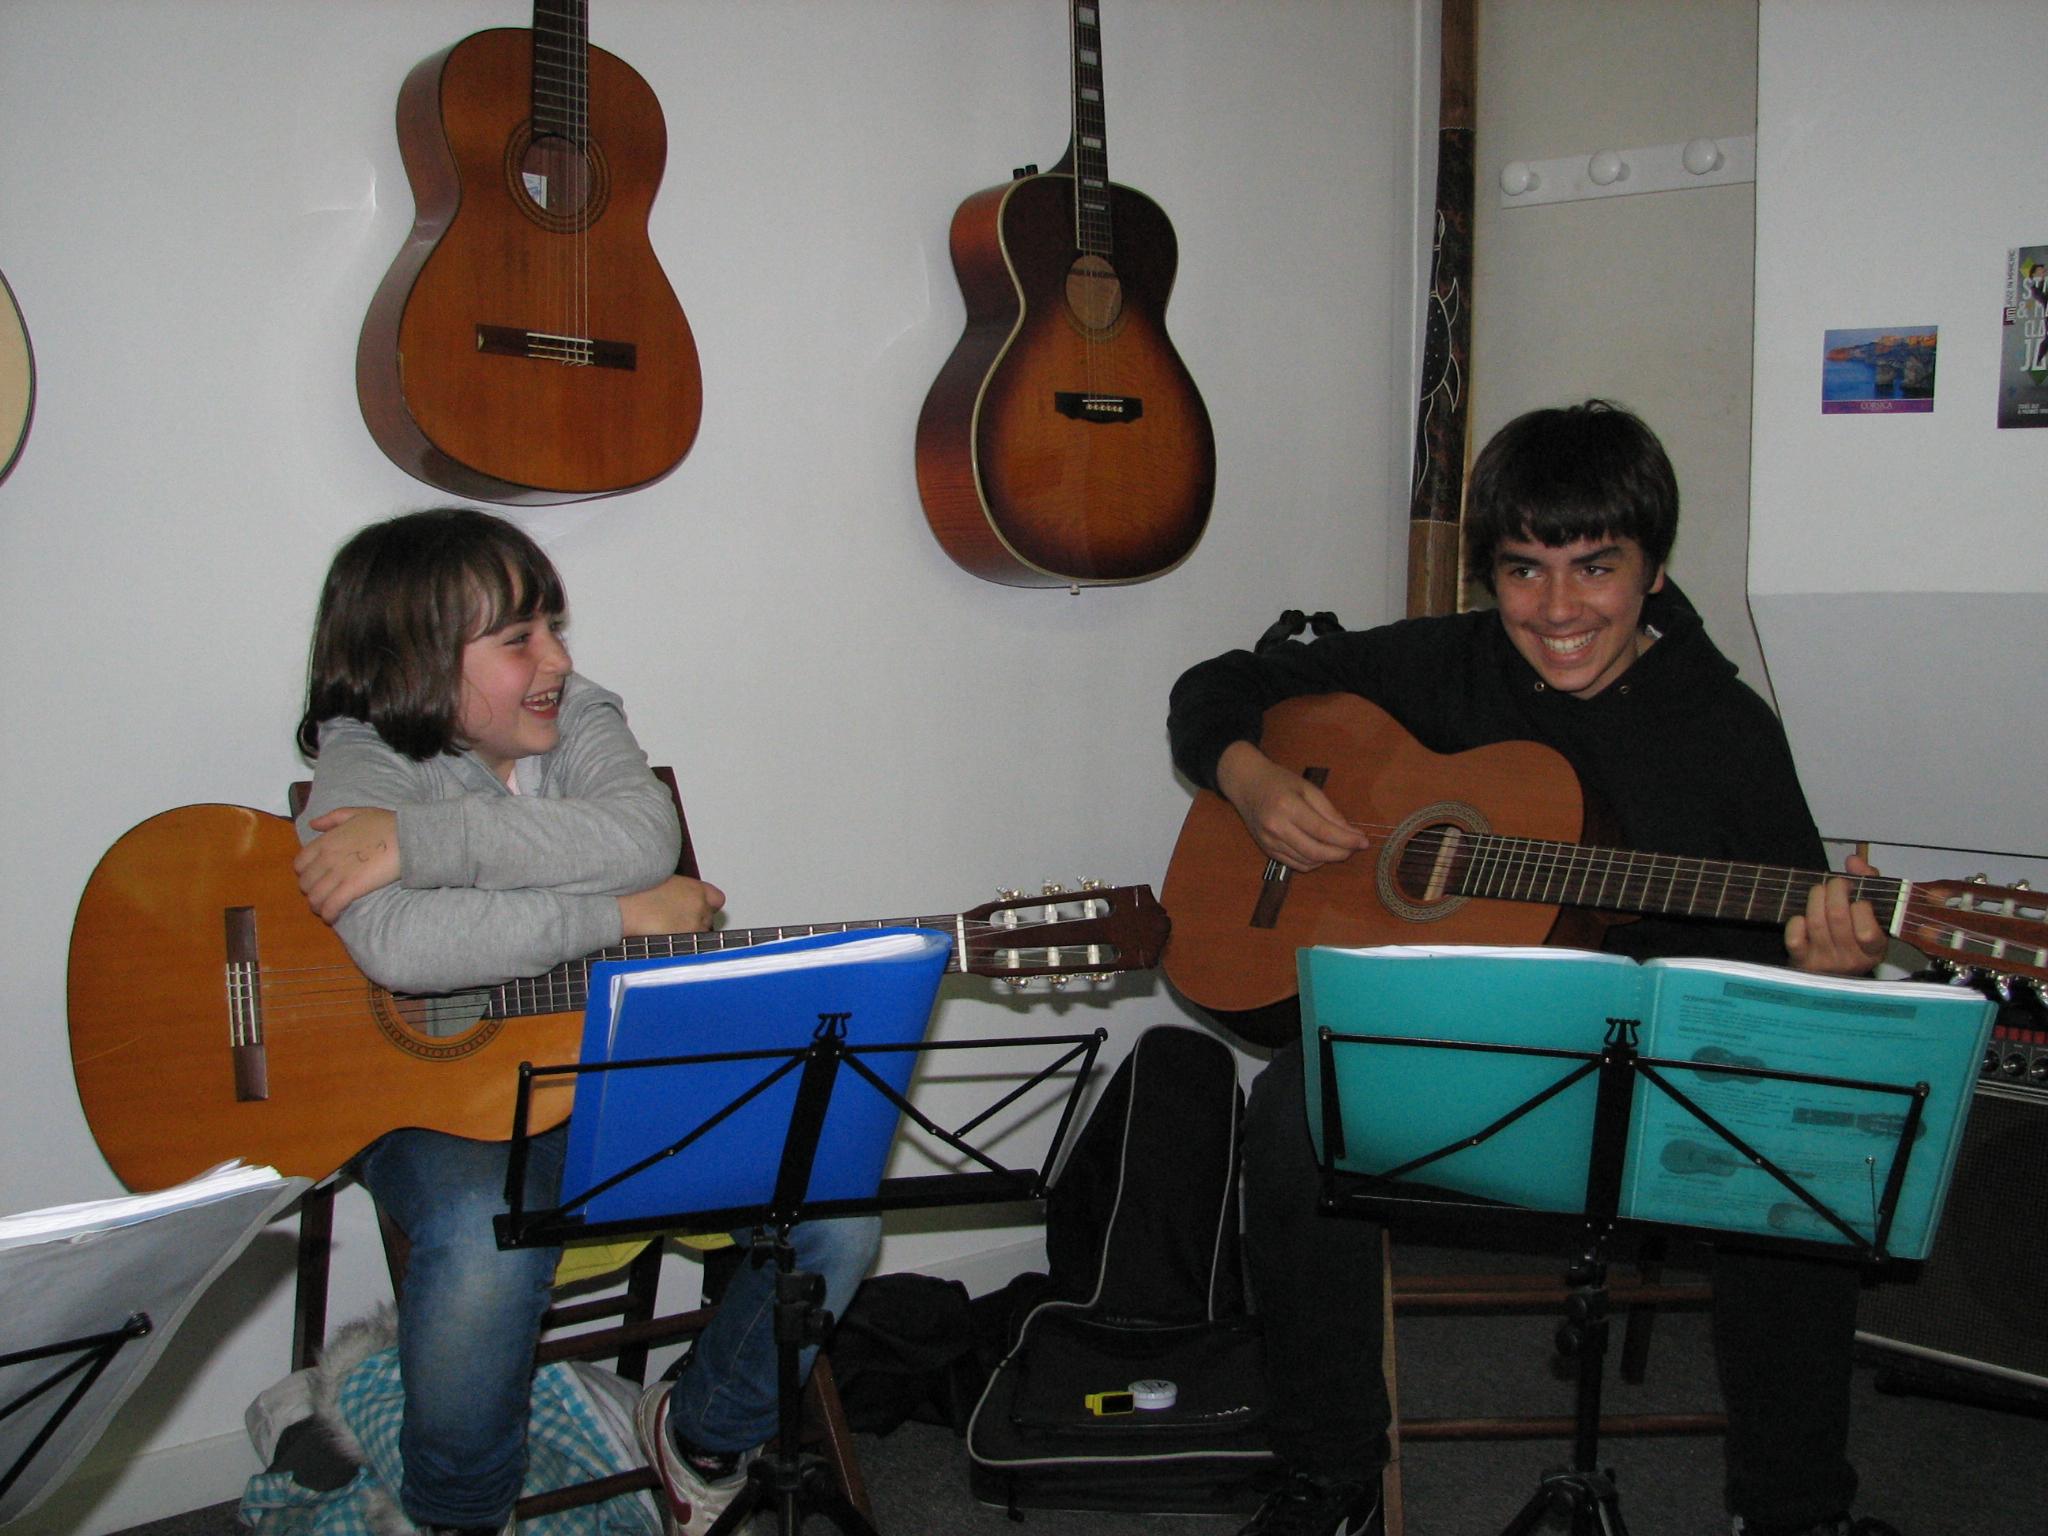 Ana et Viviant